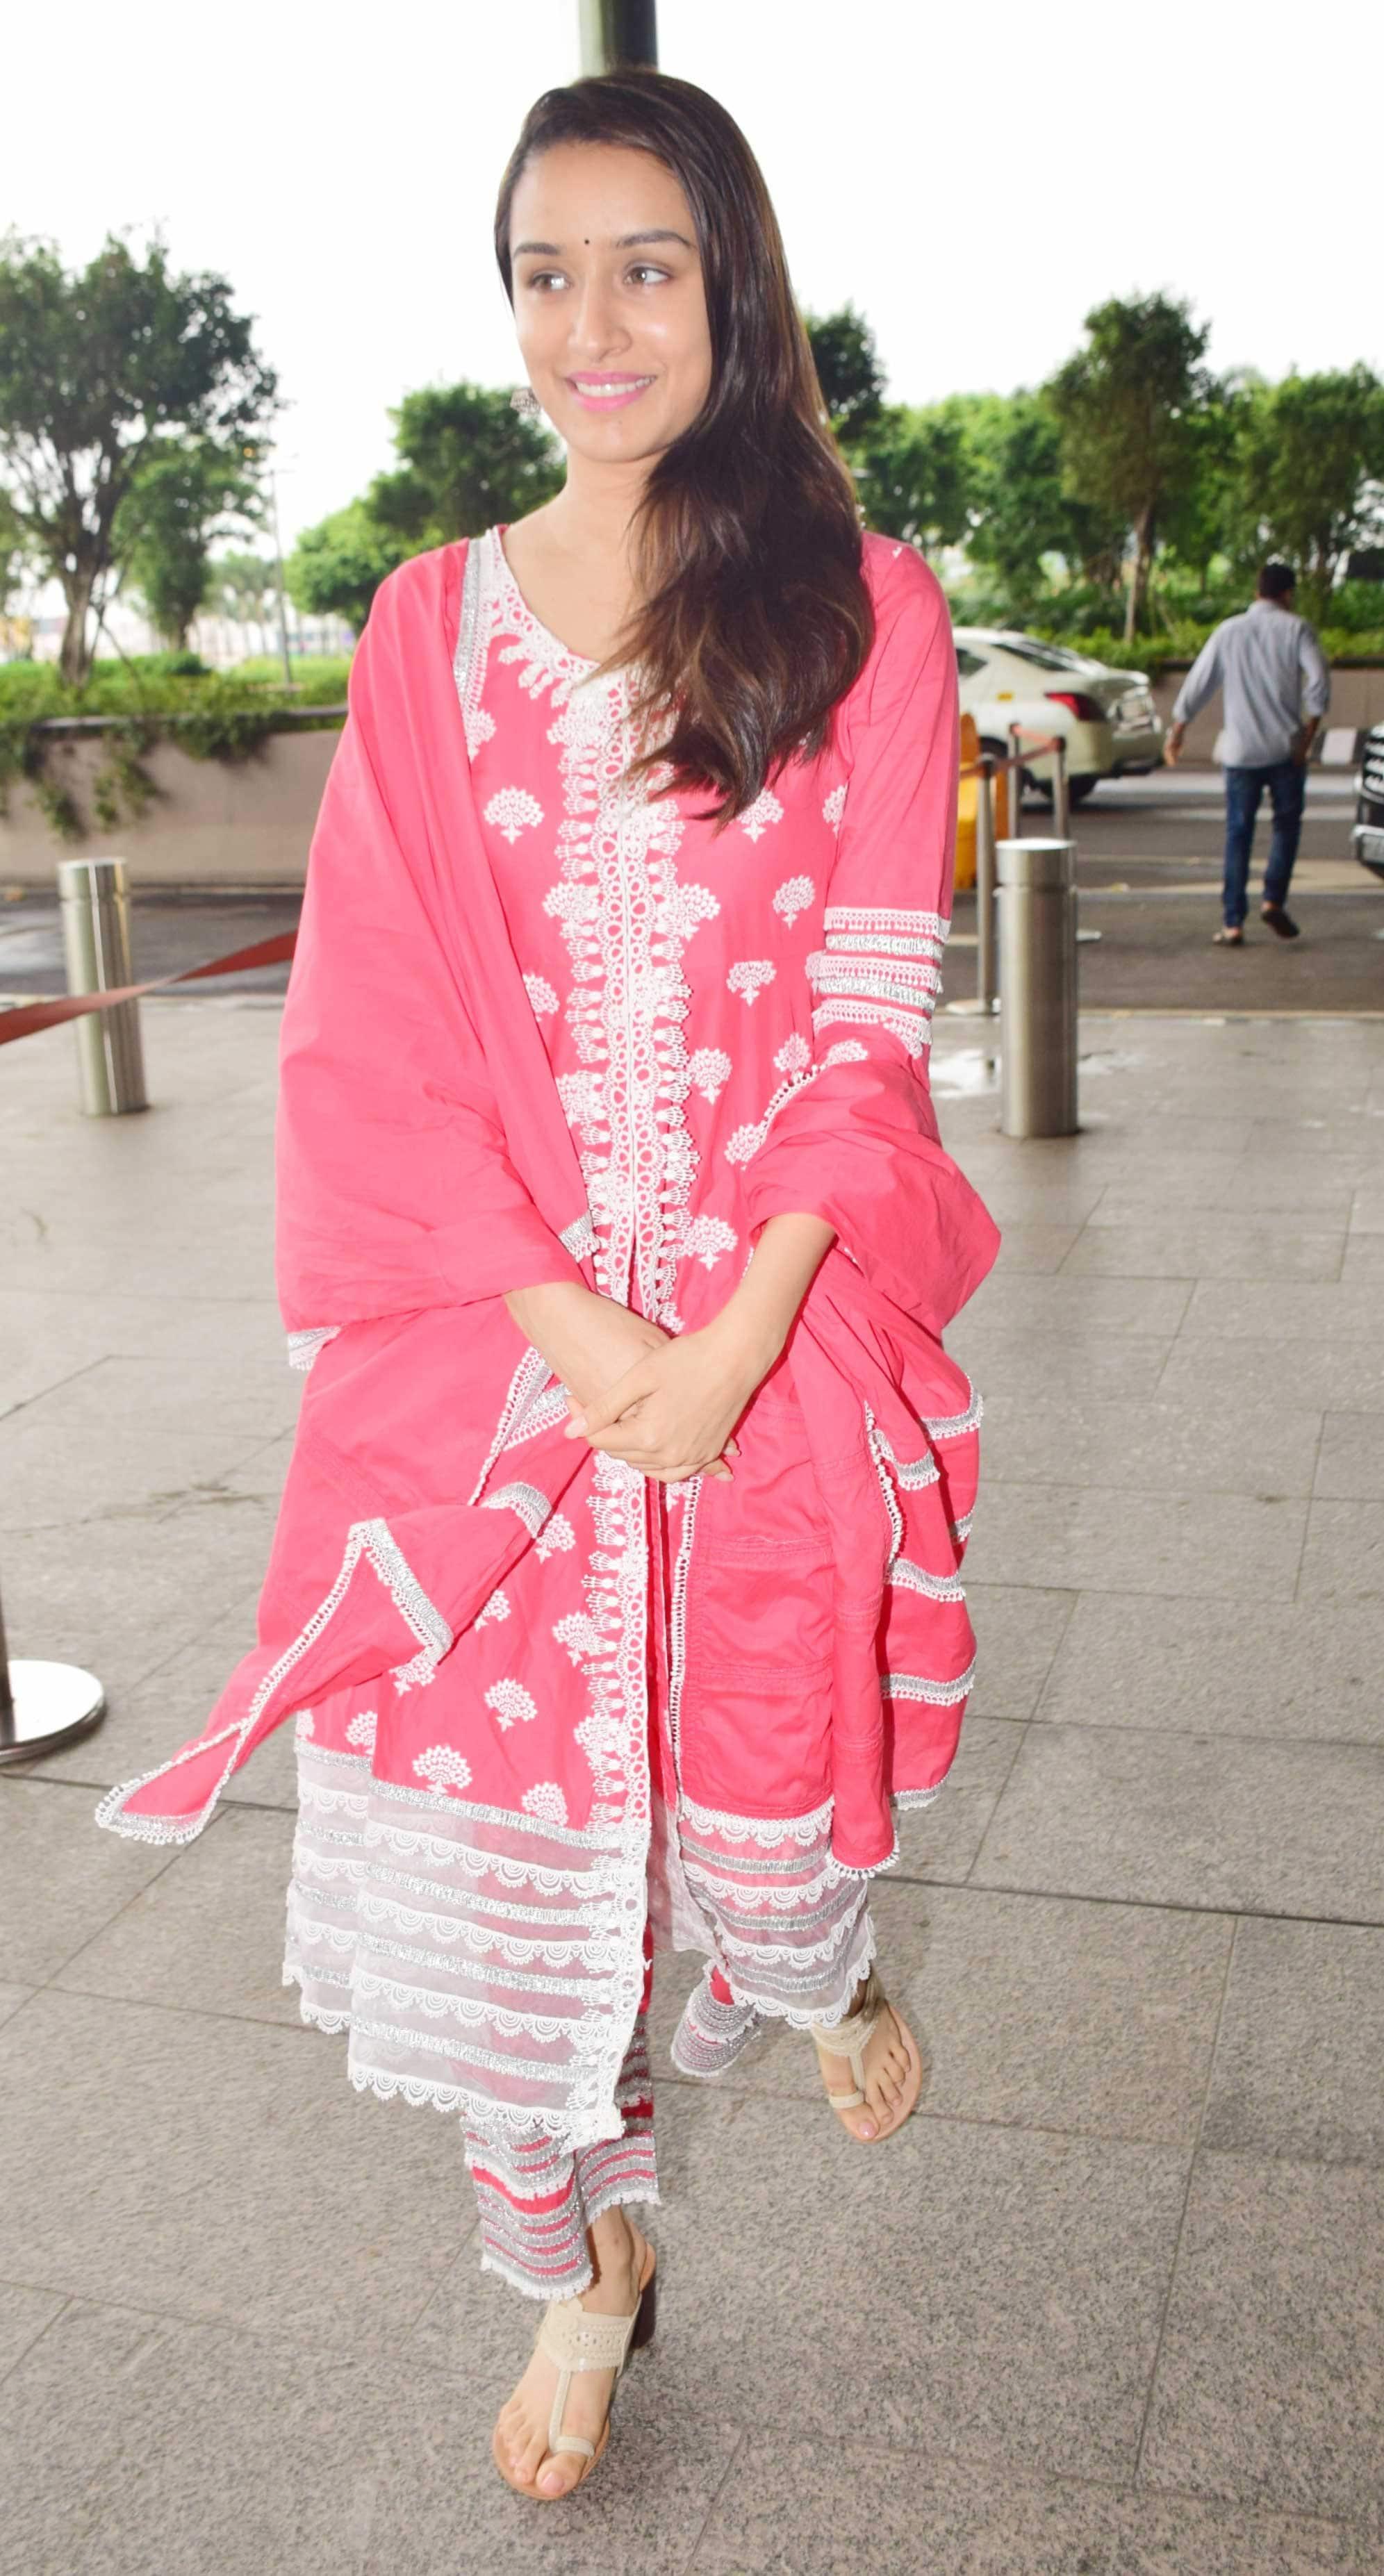 Shraddha Kapoor looks pretty in pink!